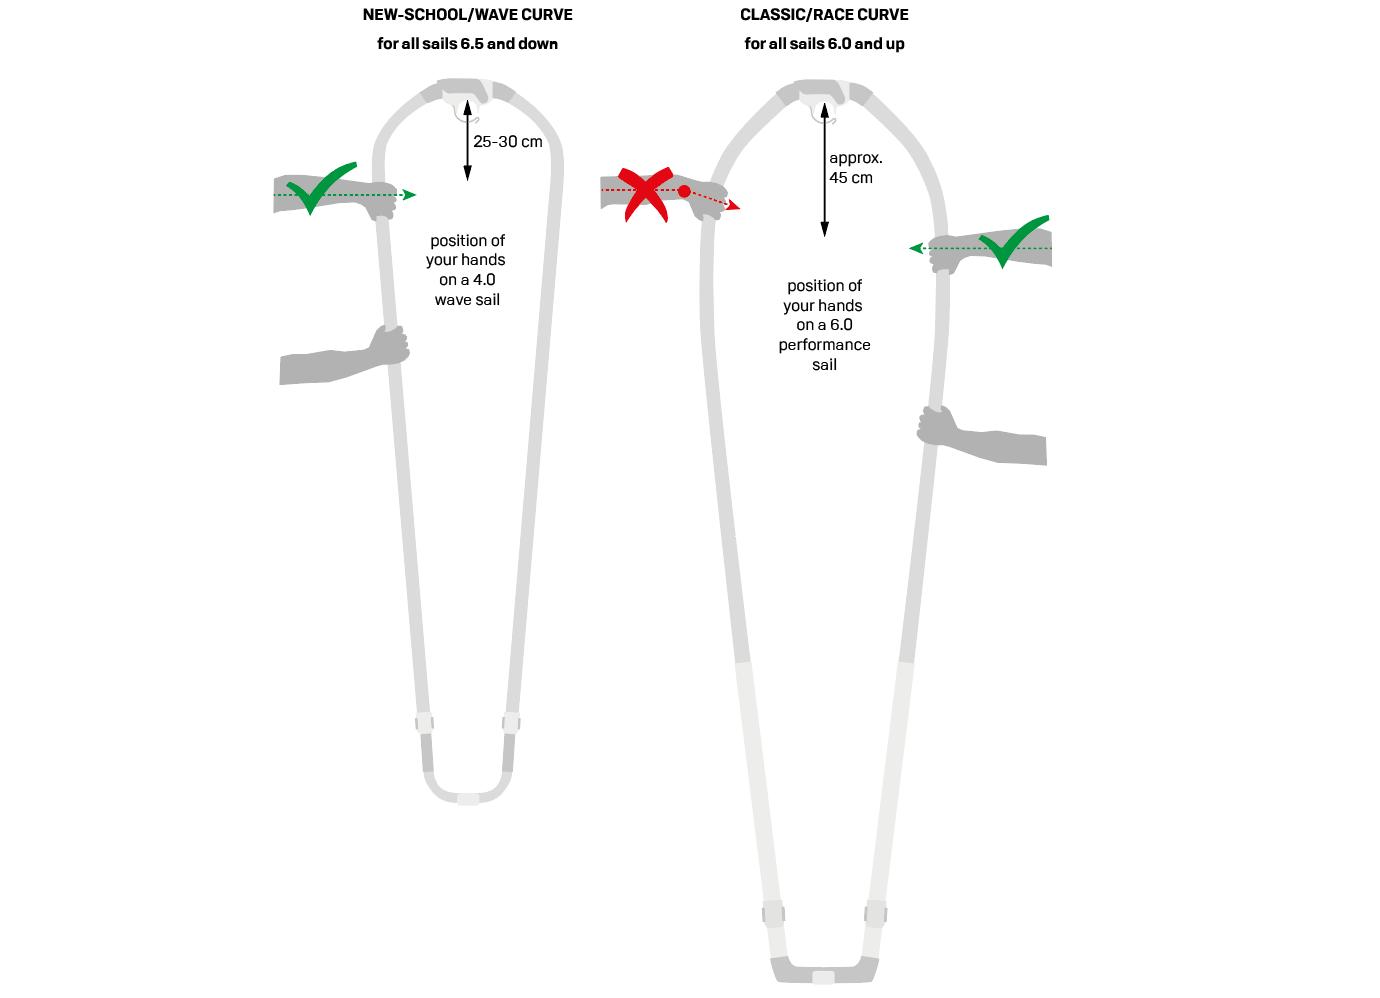 Bend Curve: New-School/Wave vs. Classic/Race